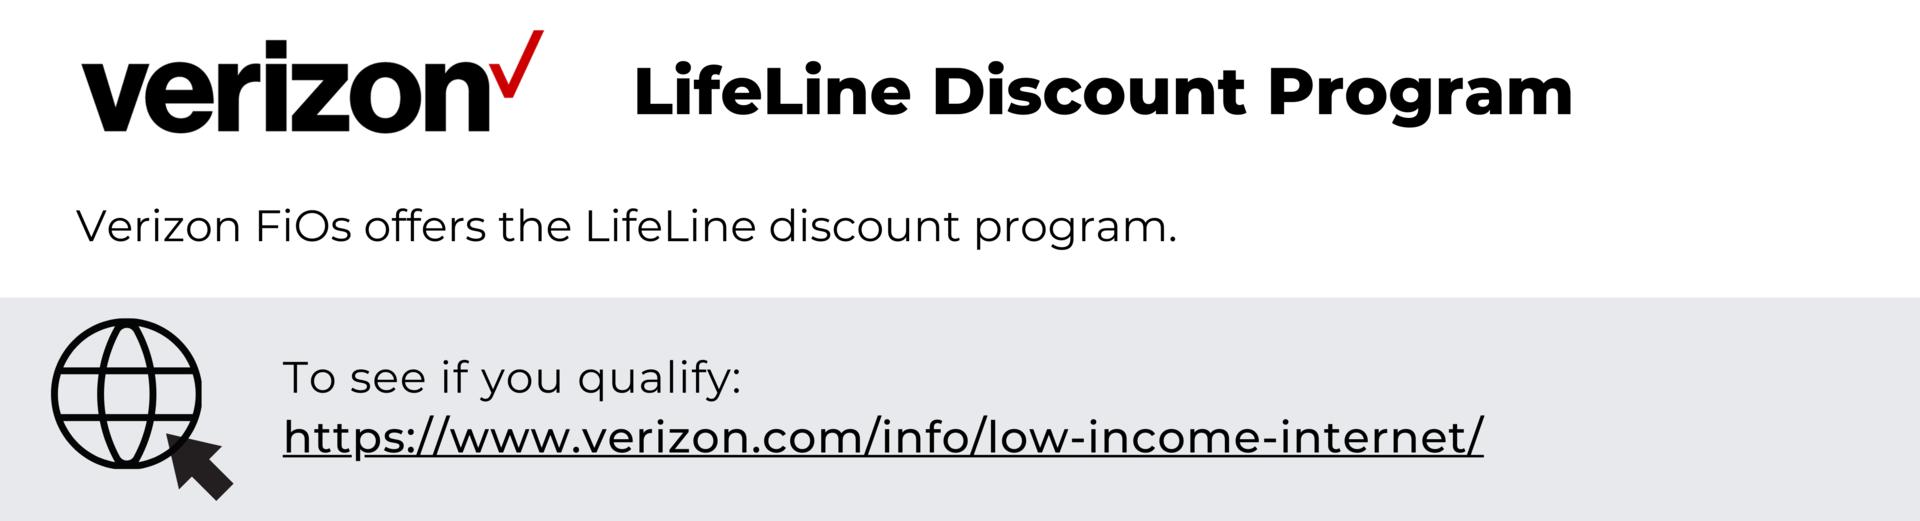 Verizon FiOs - LifeLine Discount Program